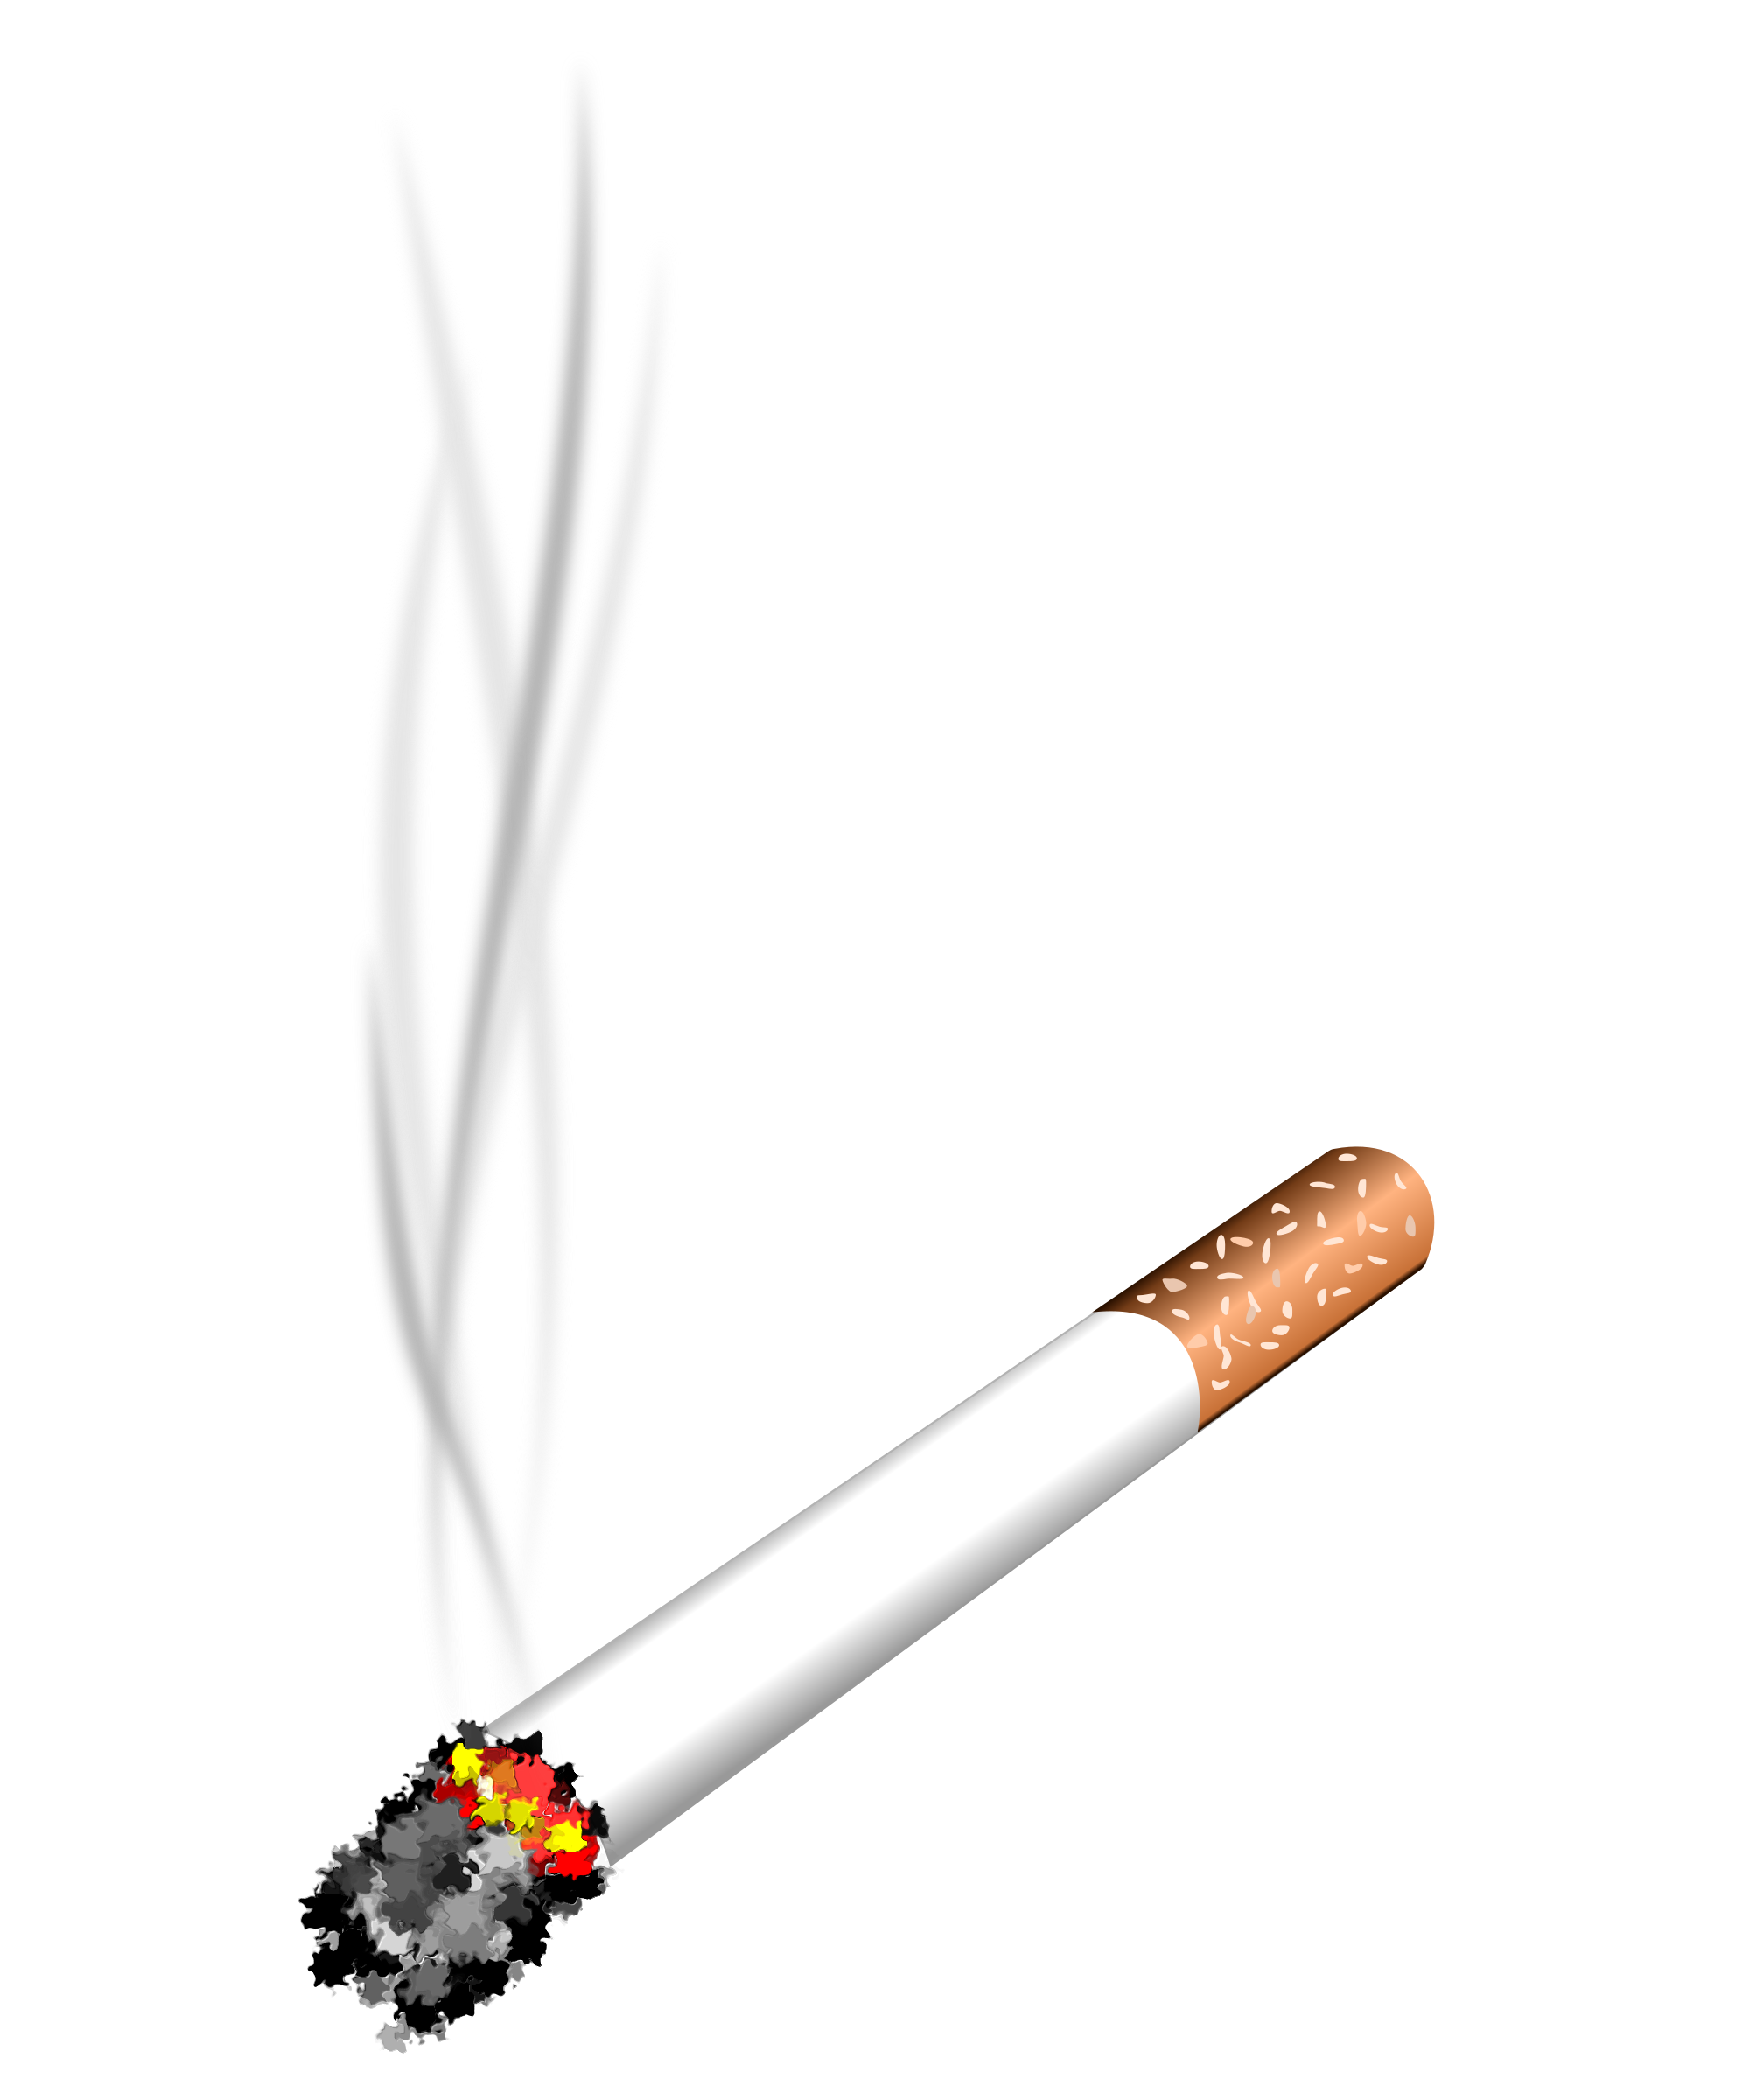 Drawn cigarette transparent background #7